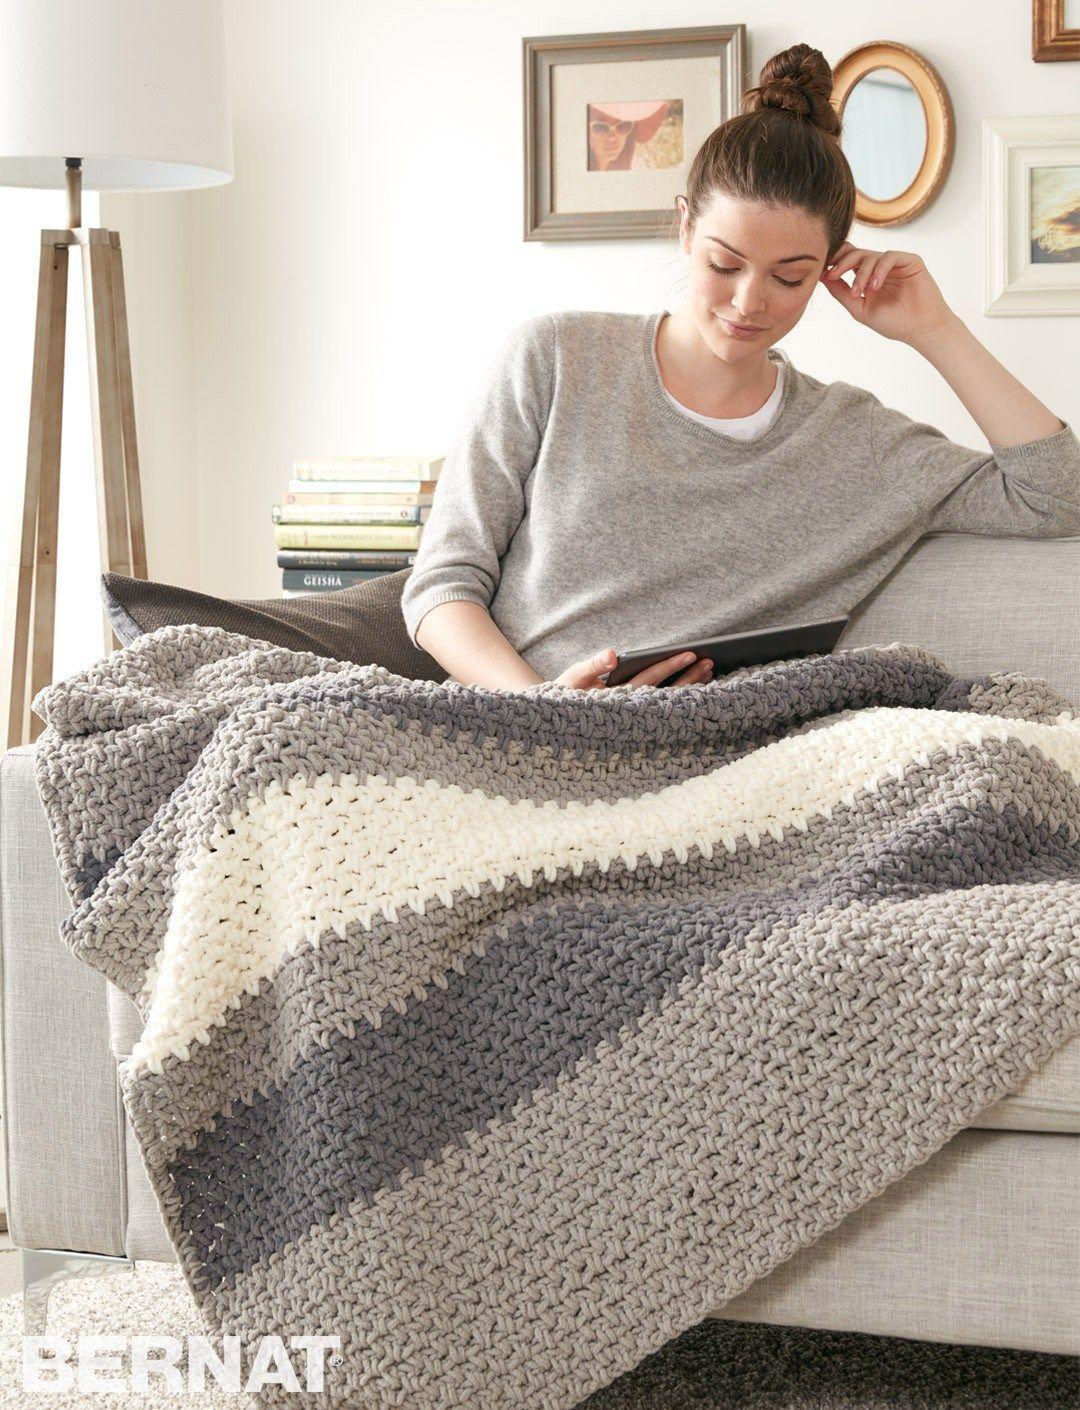 Crochet Hibernate Blanket + Tutorial | Pinterest | Decken, Häkeln ...